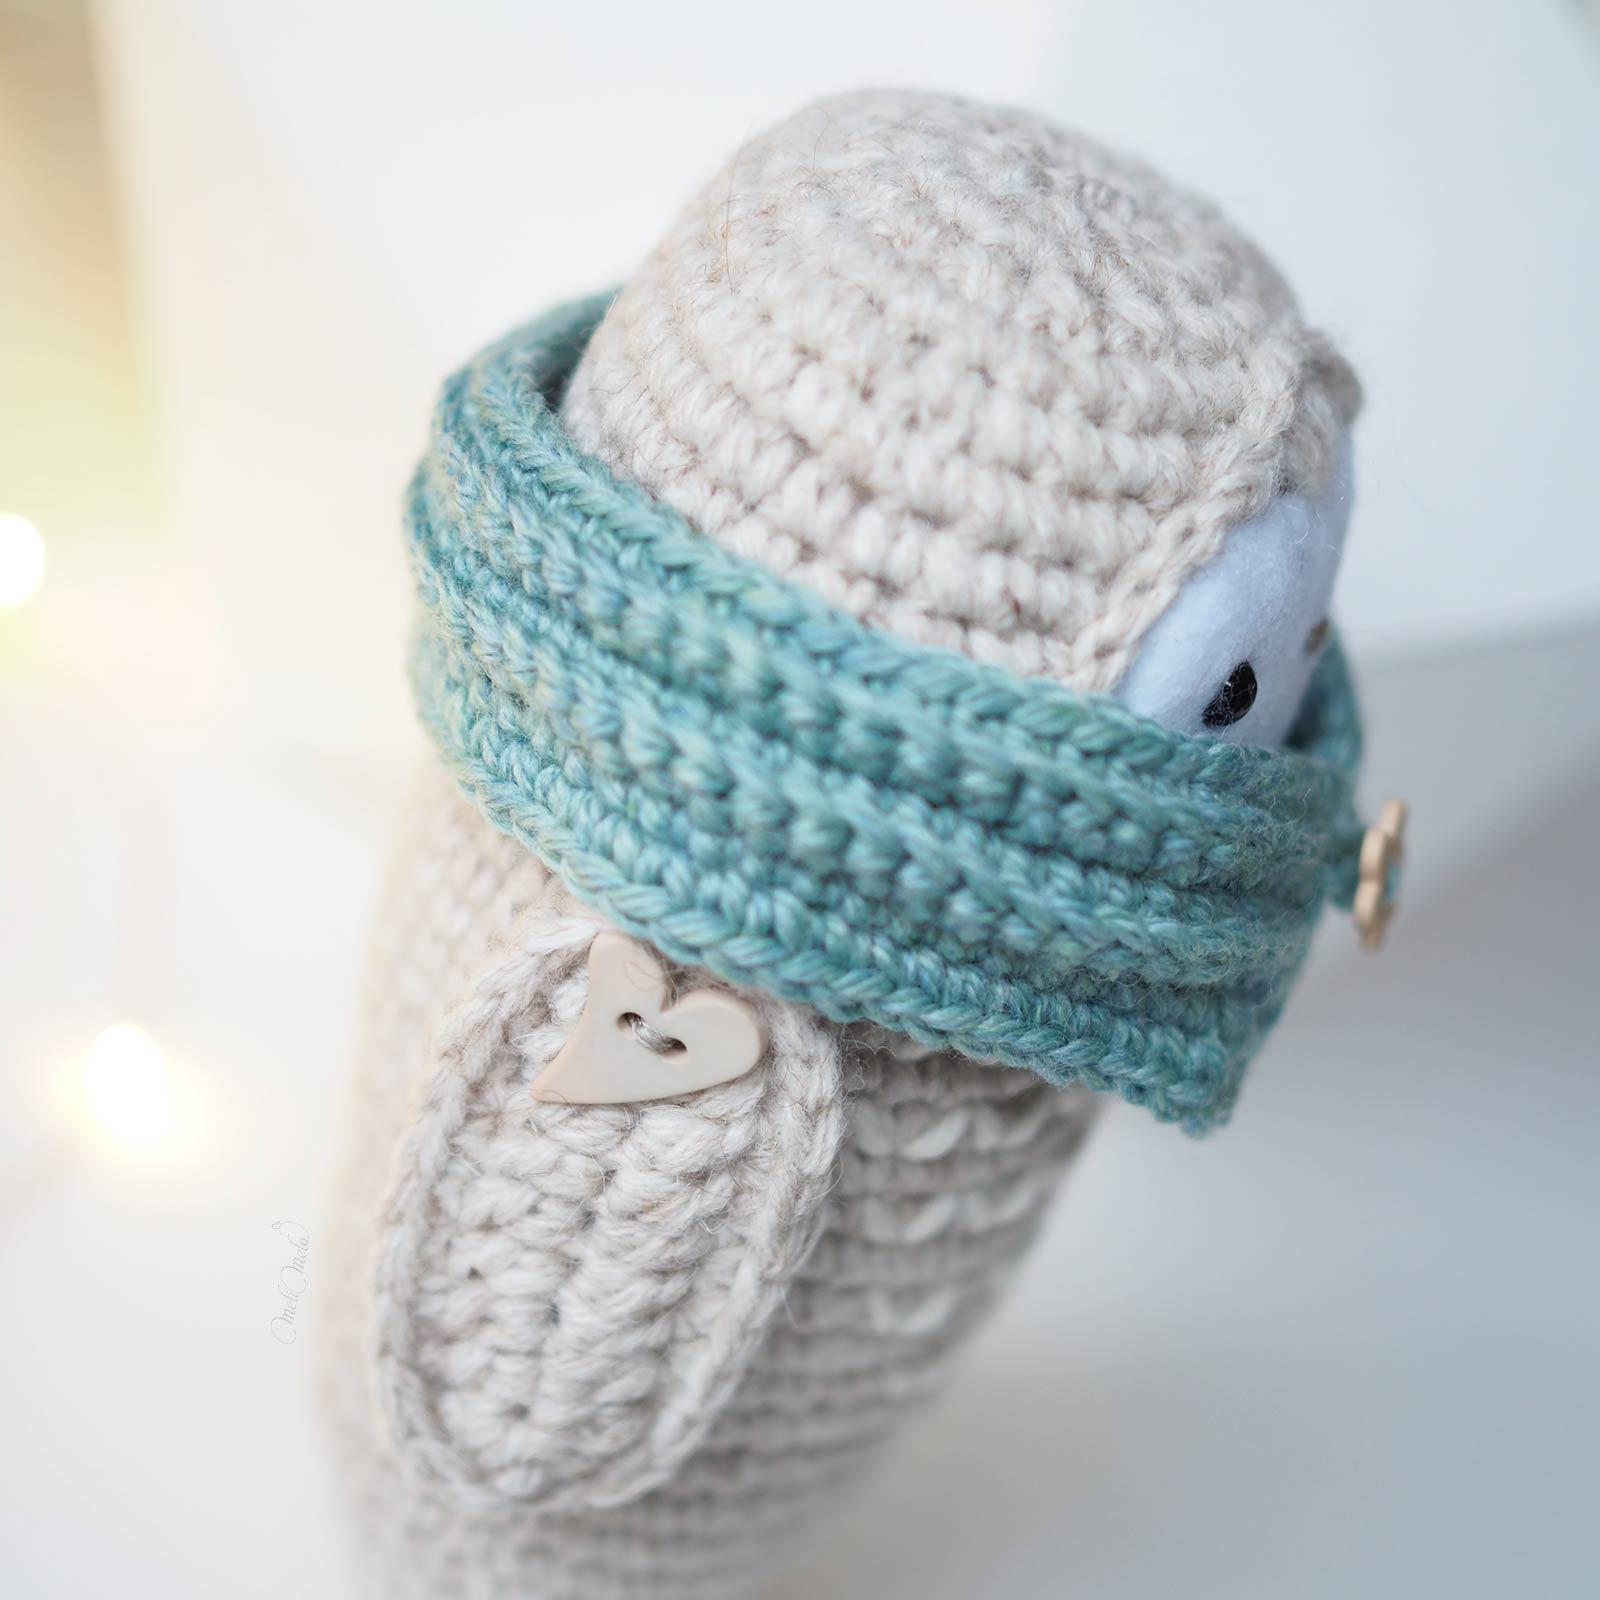 crochet chouette détail snood laine merino weareknitters aile coeur laboutiquedemelimelo